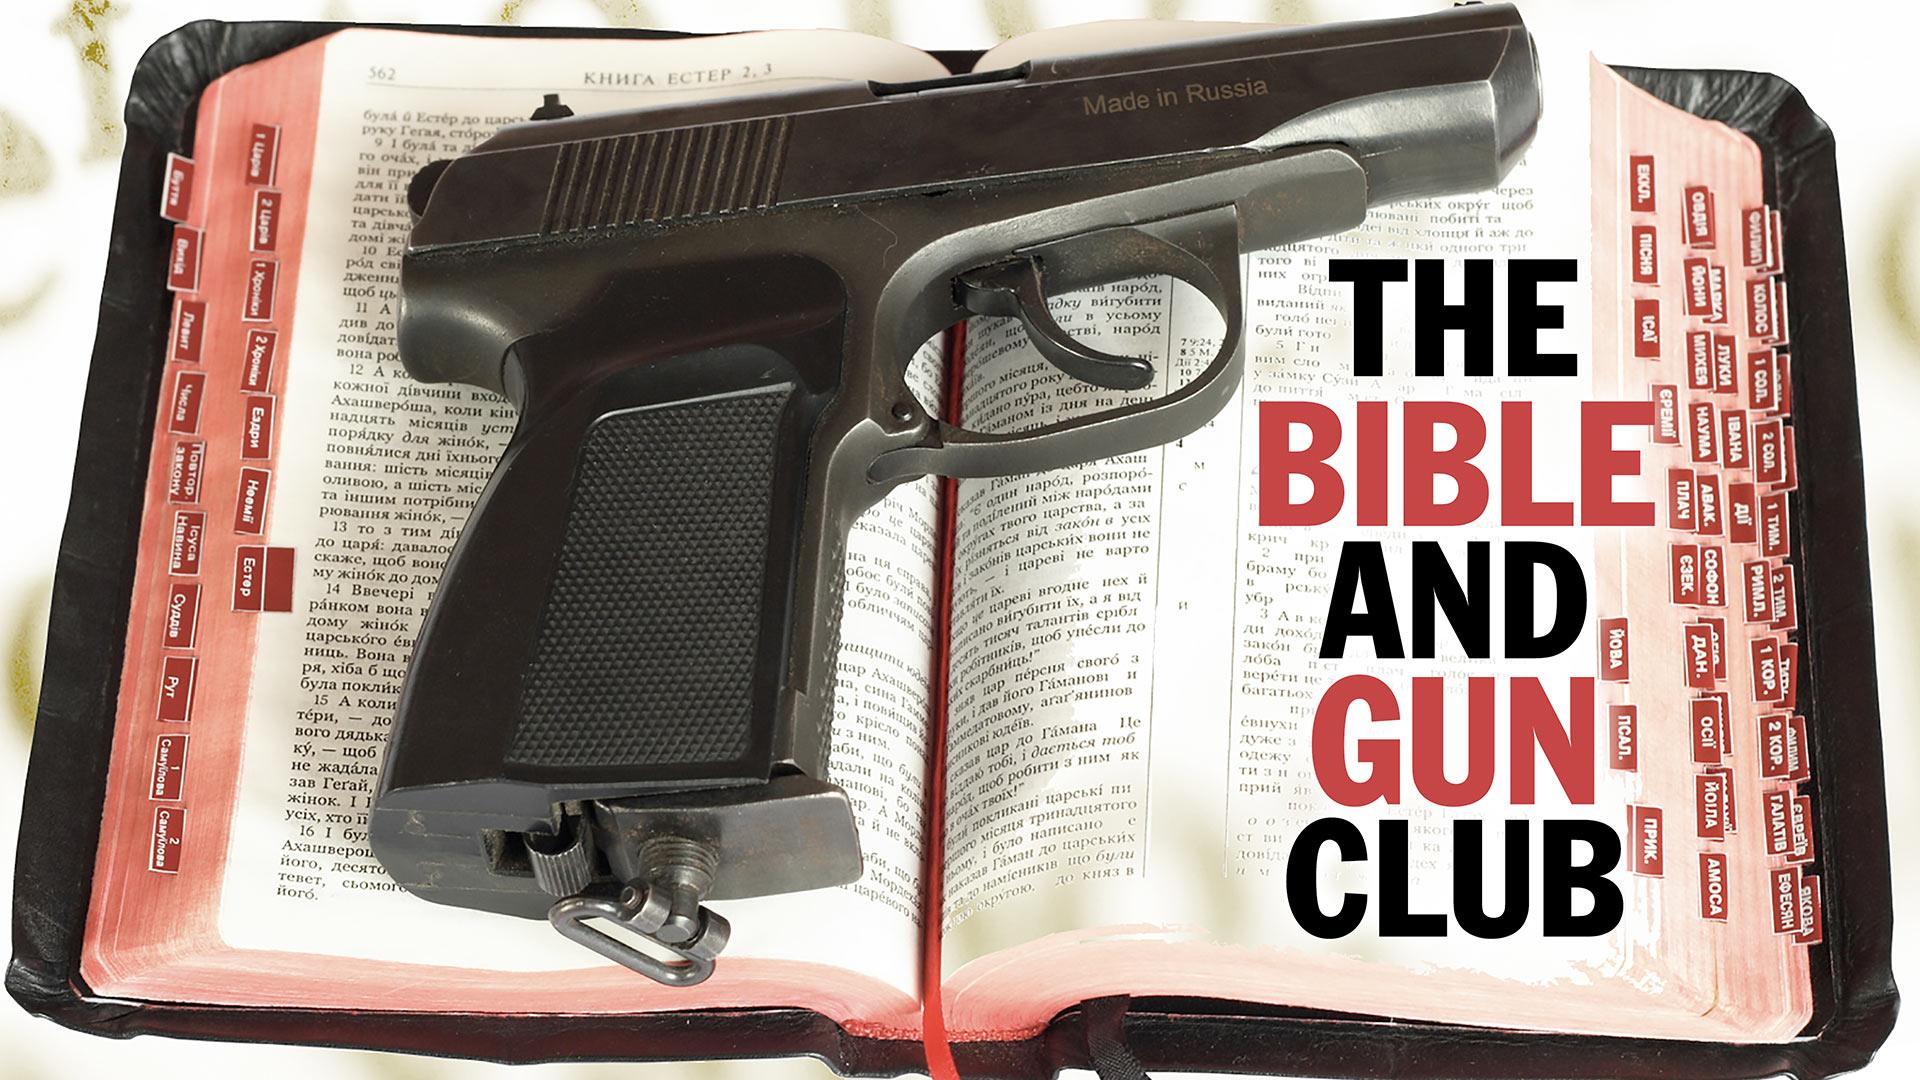 The Bible and Gun Club